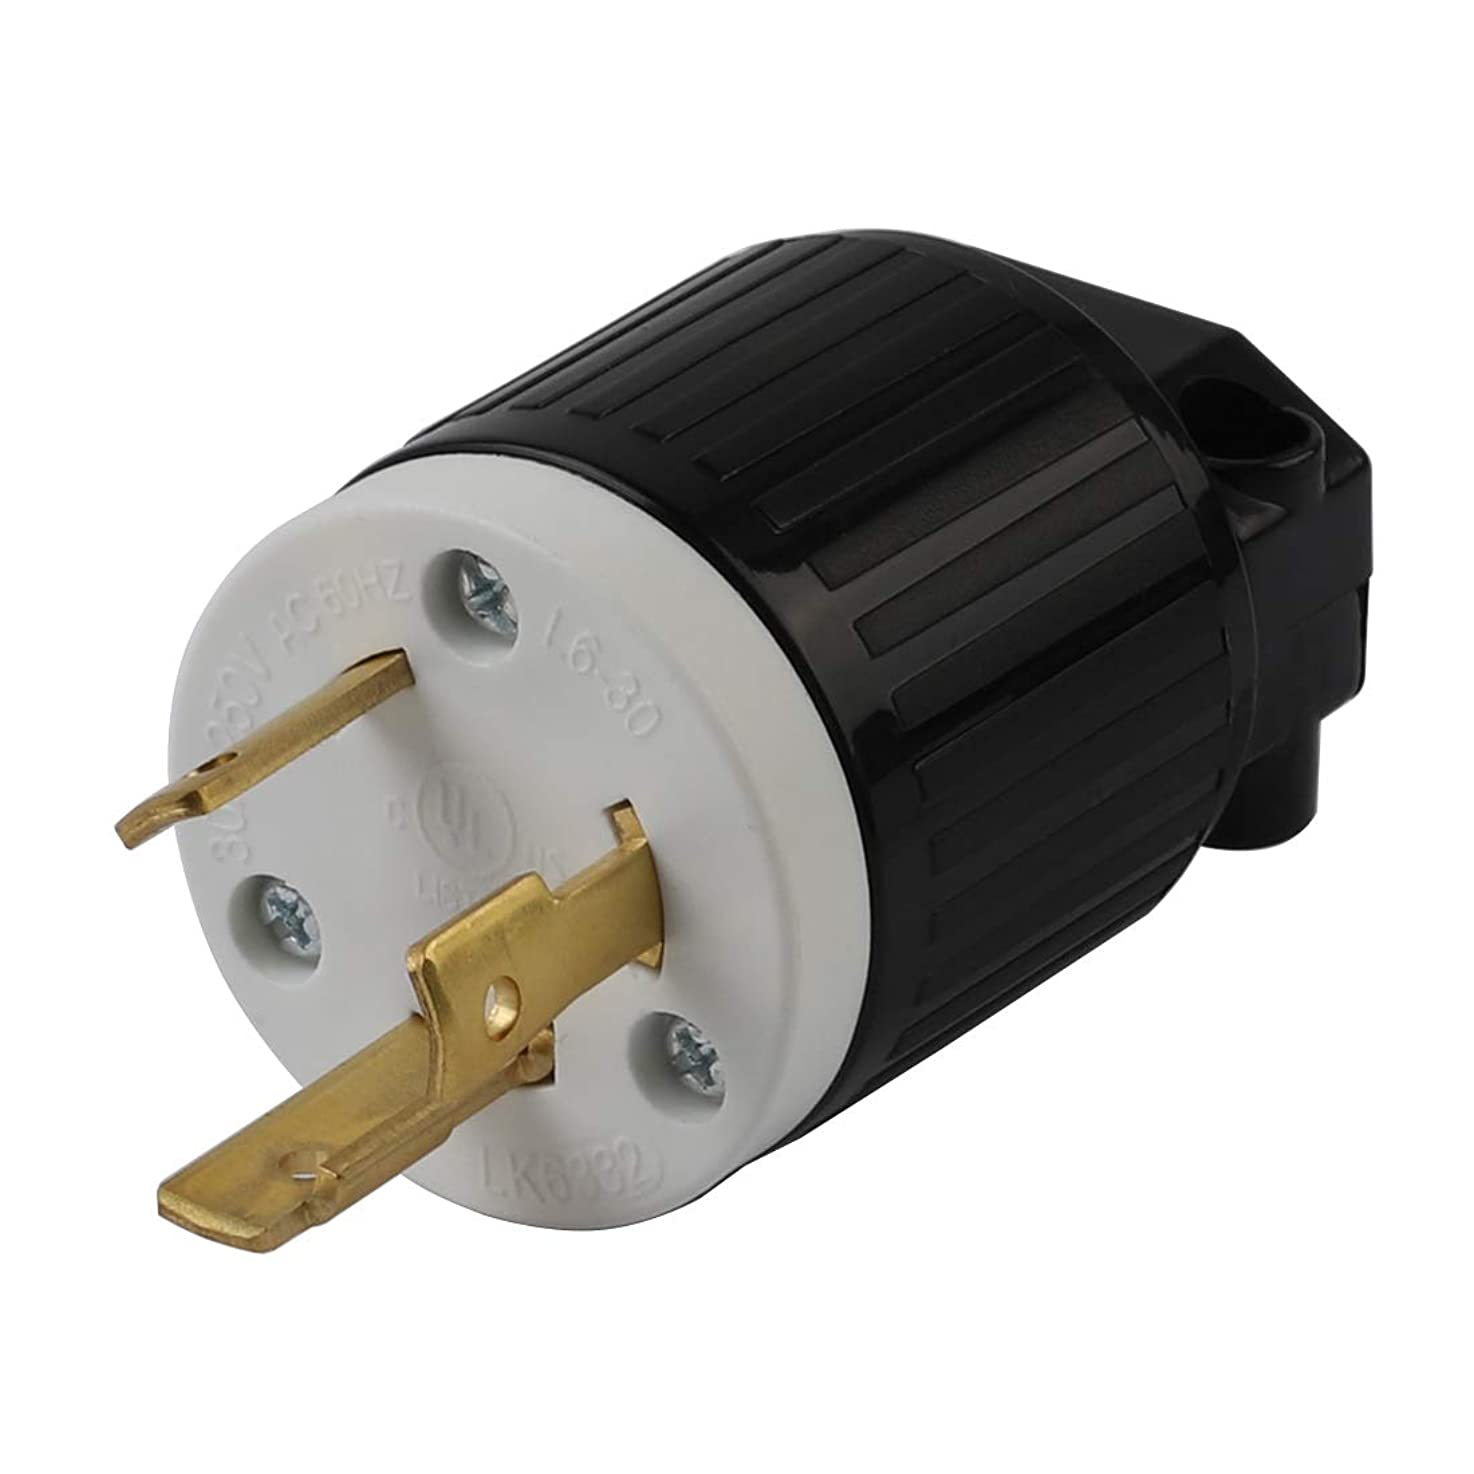 Nema L6-30P 30 Amp 250 Volt Plug, L6-30 Locking Power Cord Connector 2P 3W, Locking Plug, Industrial Grade DIY Twist-Lock Cord Male Plug